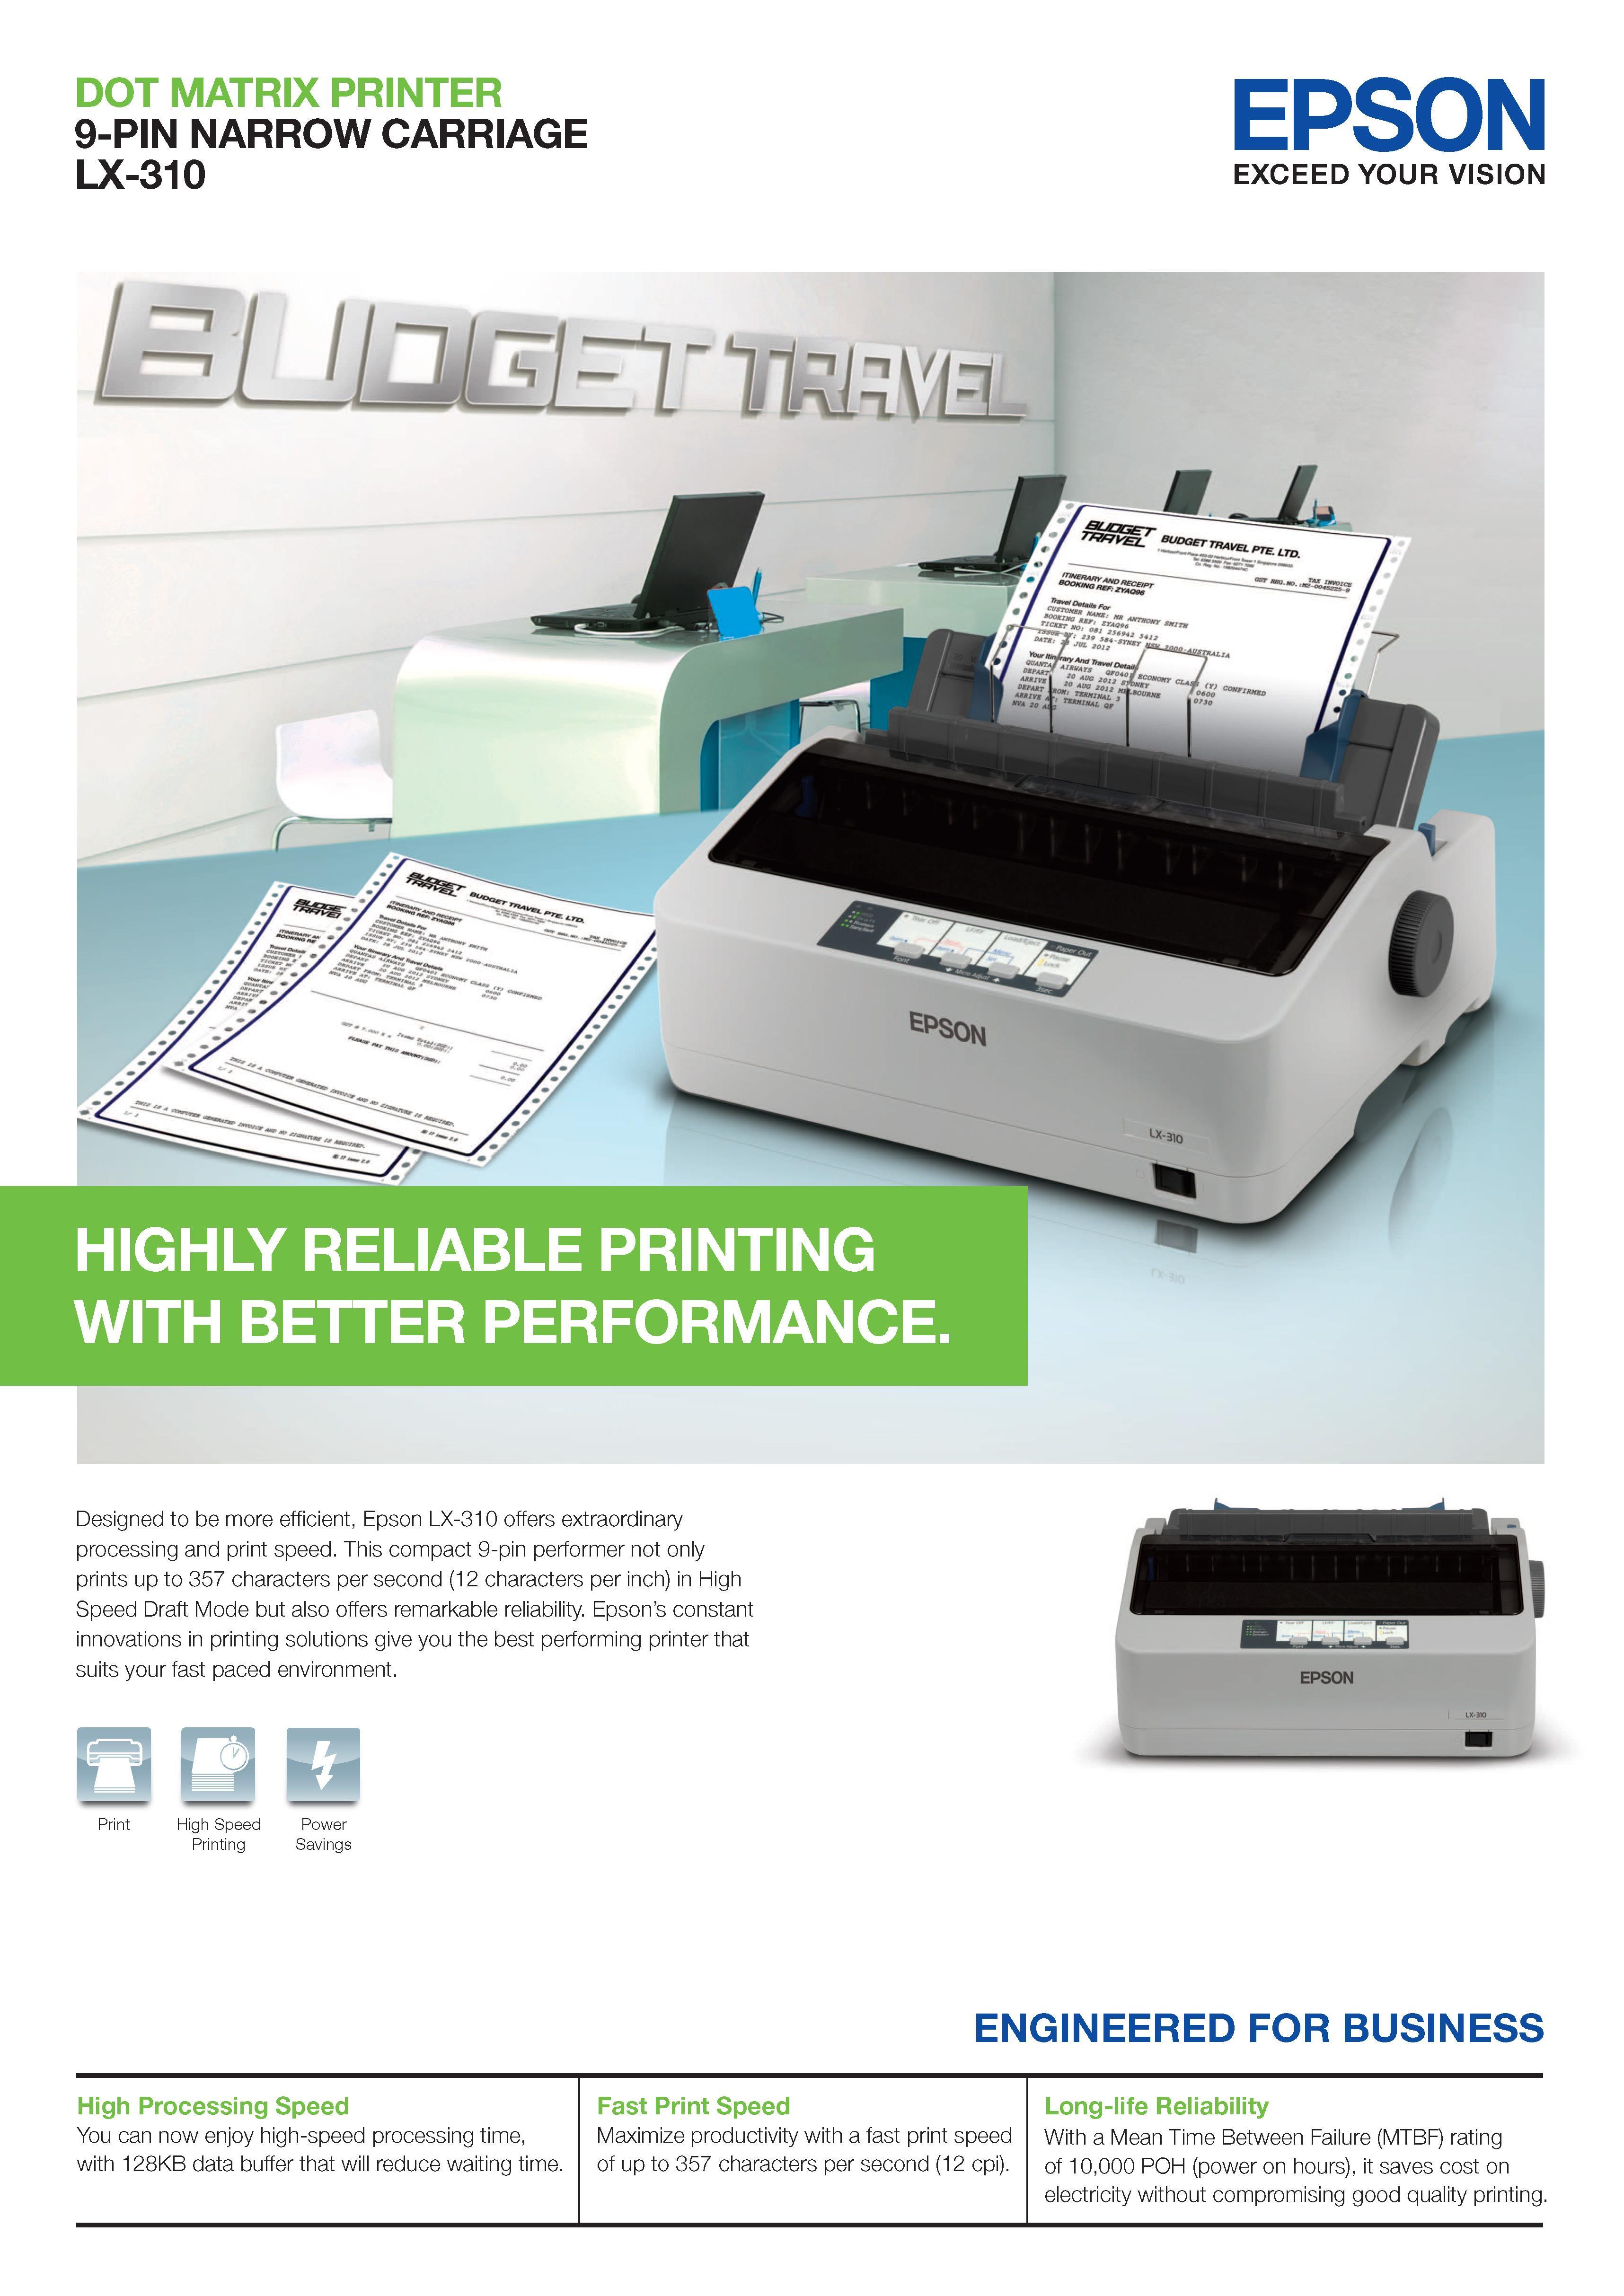 Epson Lx 310 Dot Matrix Printer Spec Dan Daftar Harga Terbaru Carriage Unit Lx310 Original New Page 1